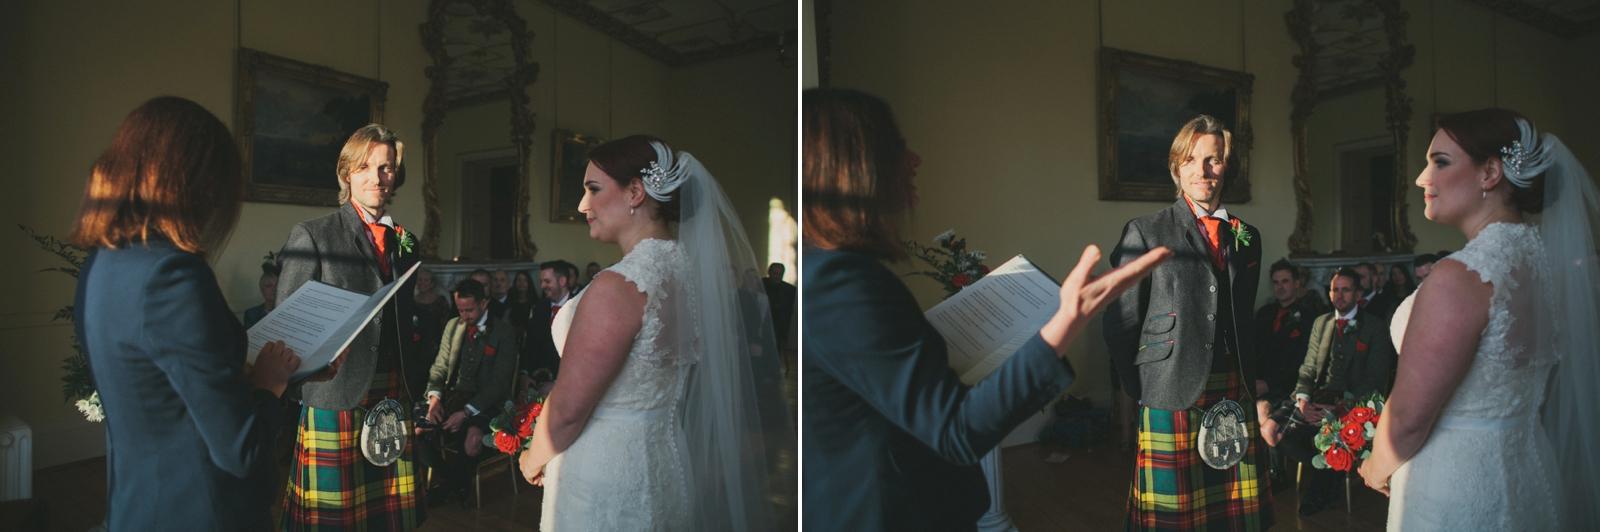 Emma+Ali-Wedding-136.JPG